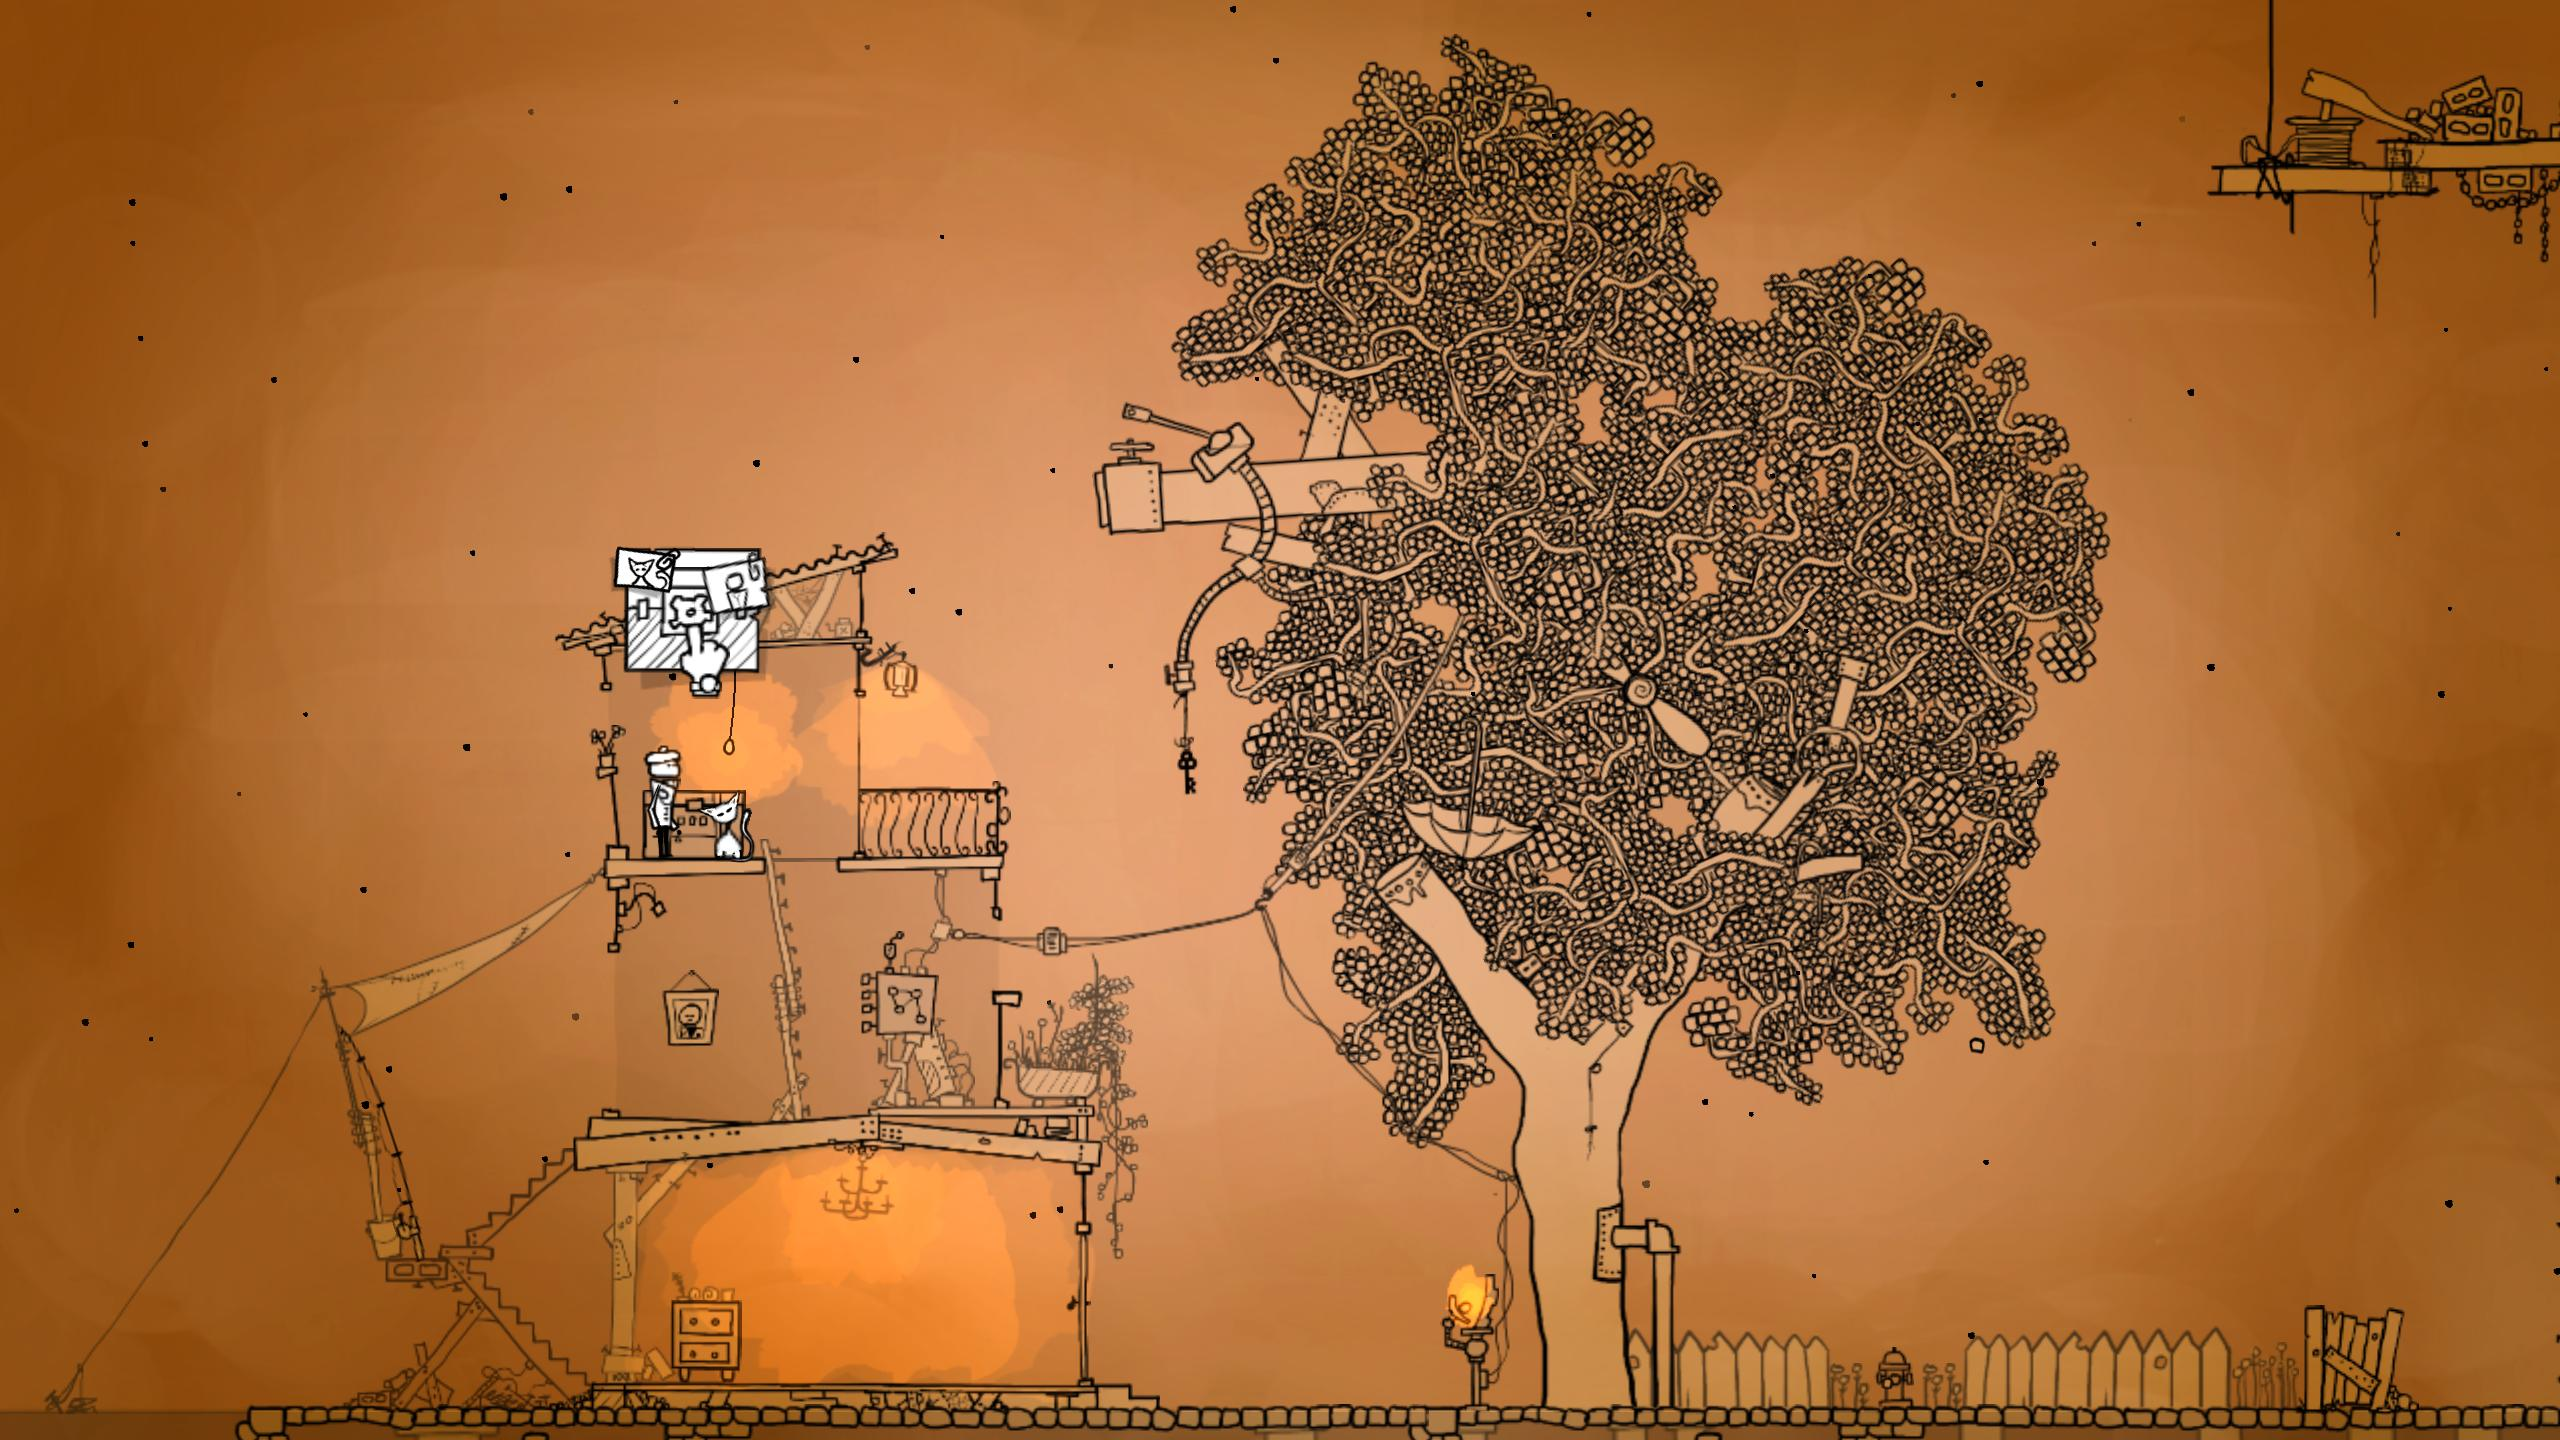 Скриншоты к 39 Days to Mars v1.0.0.1 - полная русская версия